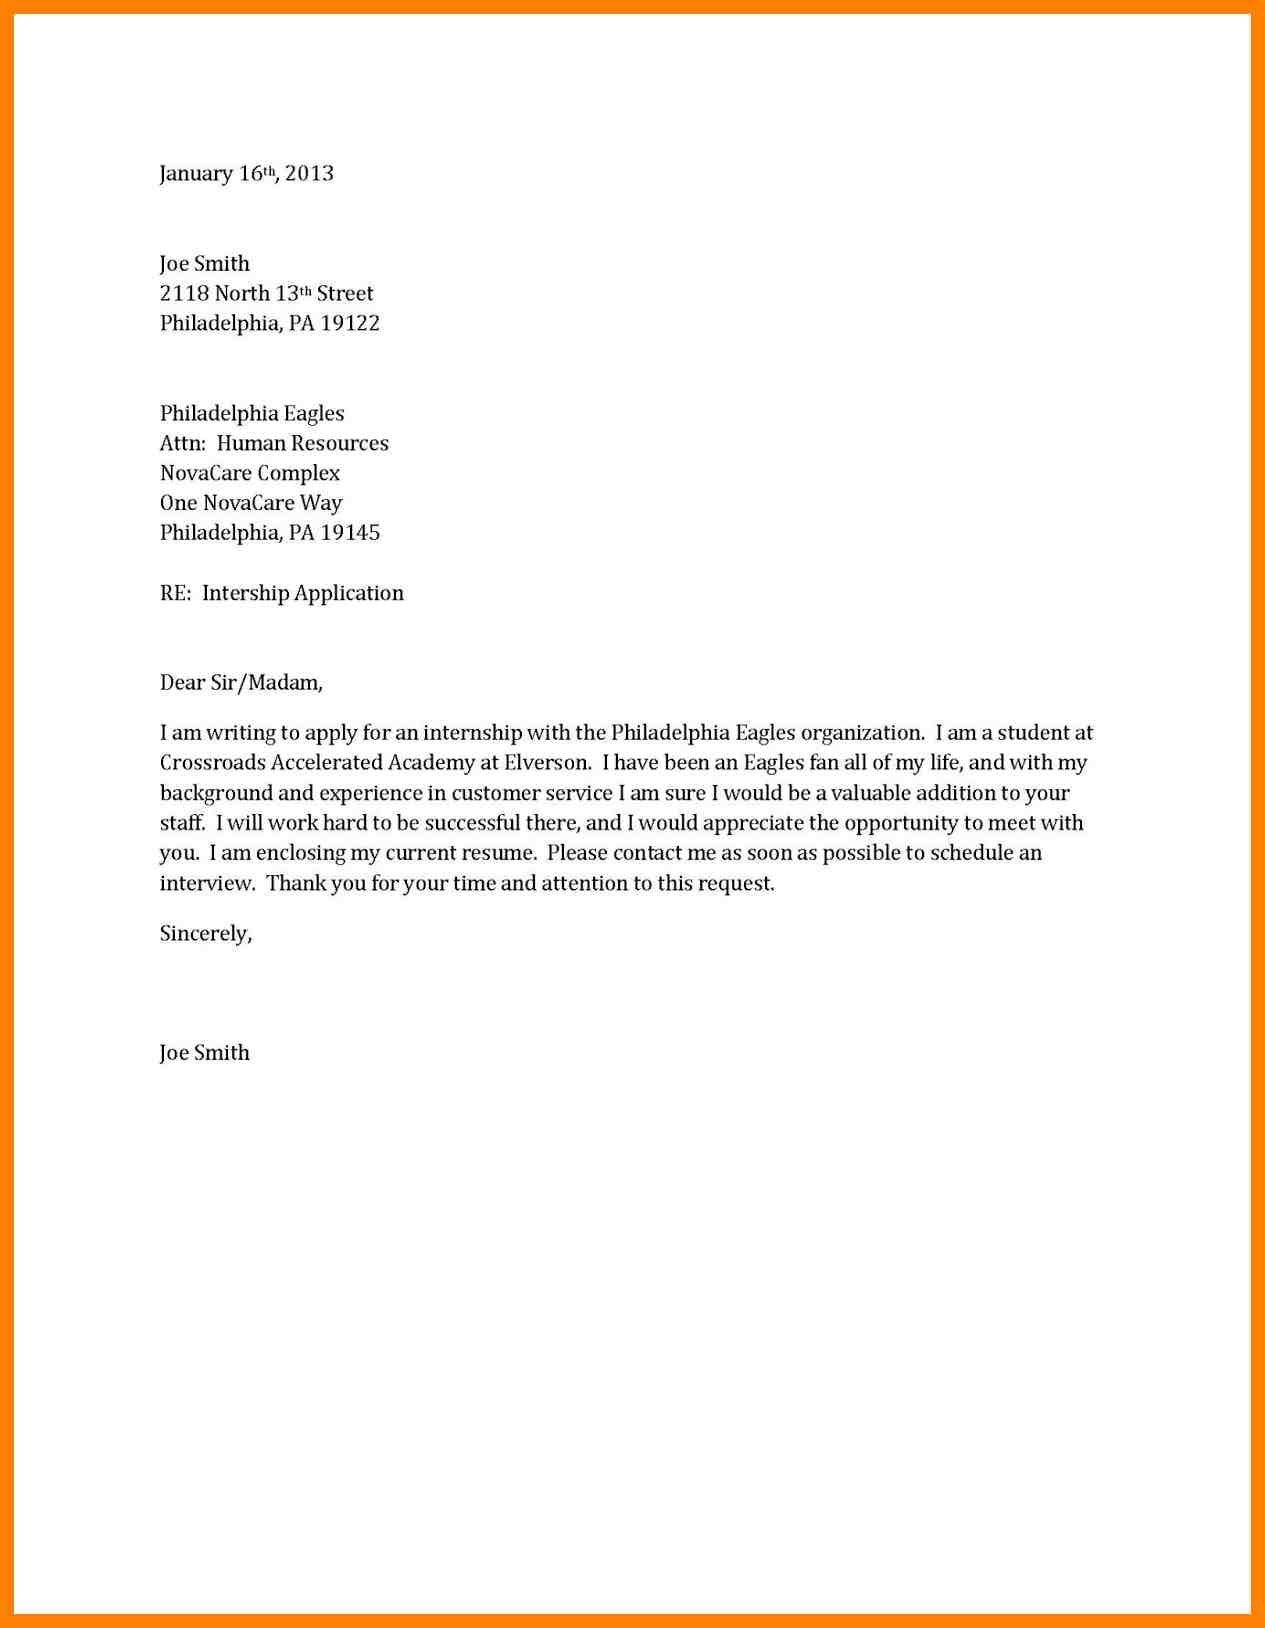 23 Short Cover Letter In 2020 Cover Letter For Resume Cover